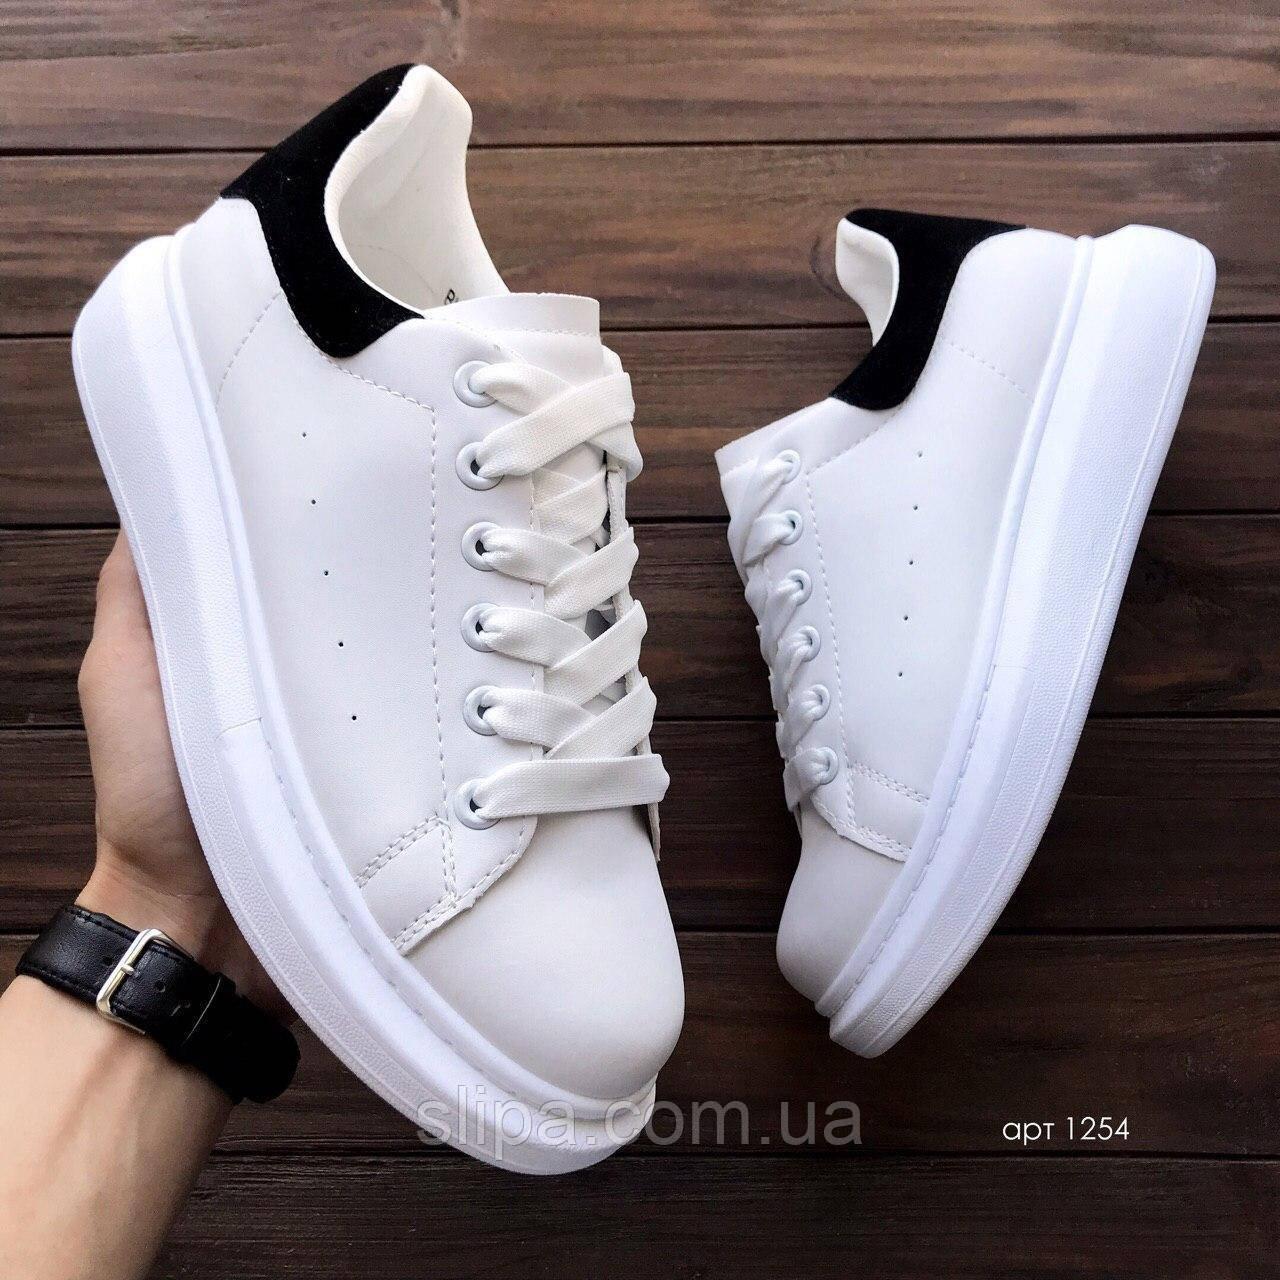 Мужские кроссовки из эко кожи Mac Vin White